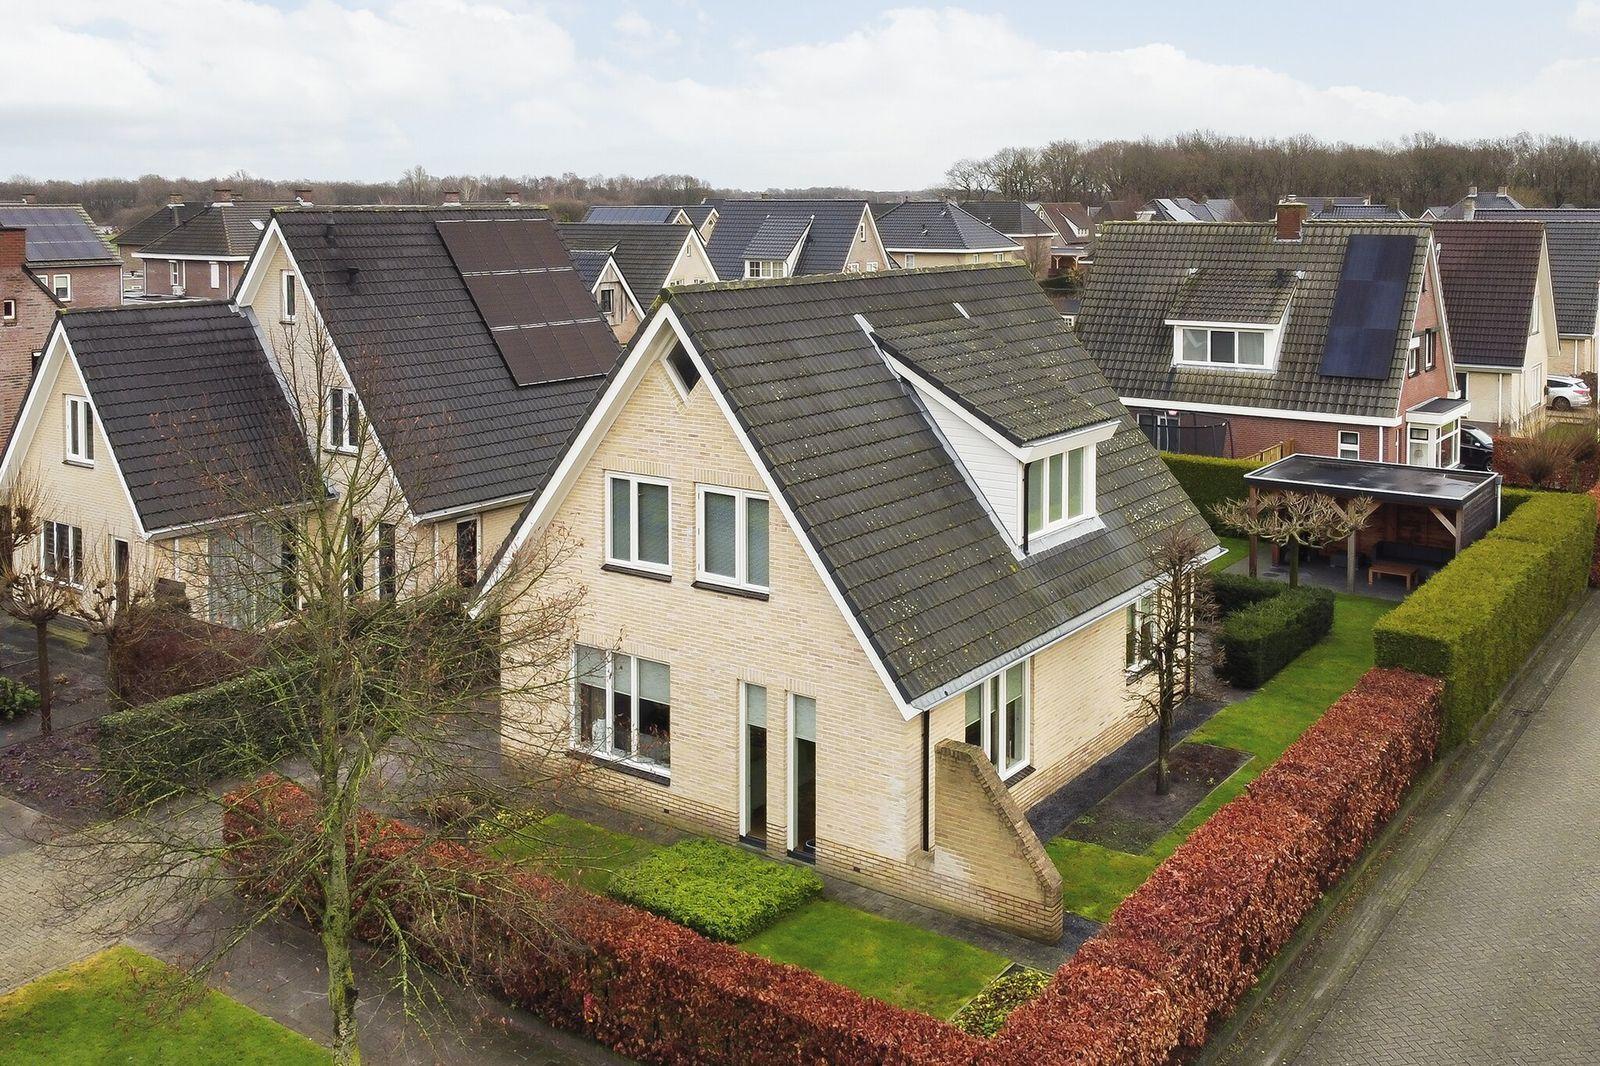 Bark 30, Nieuw-amsterdam